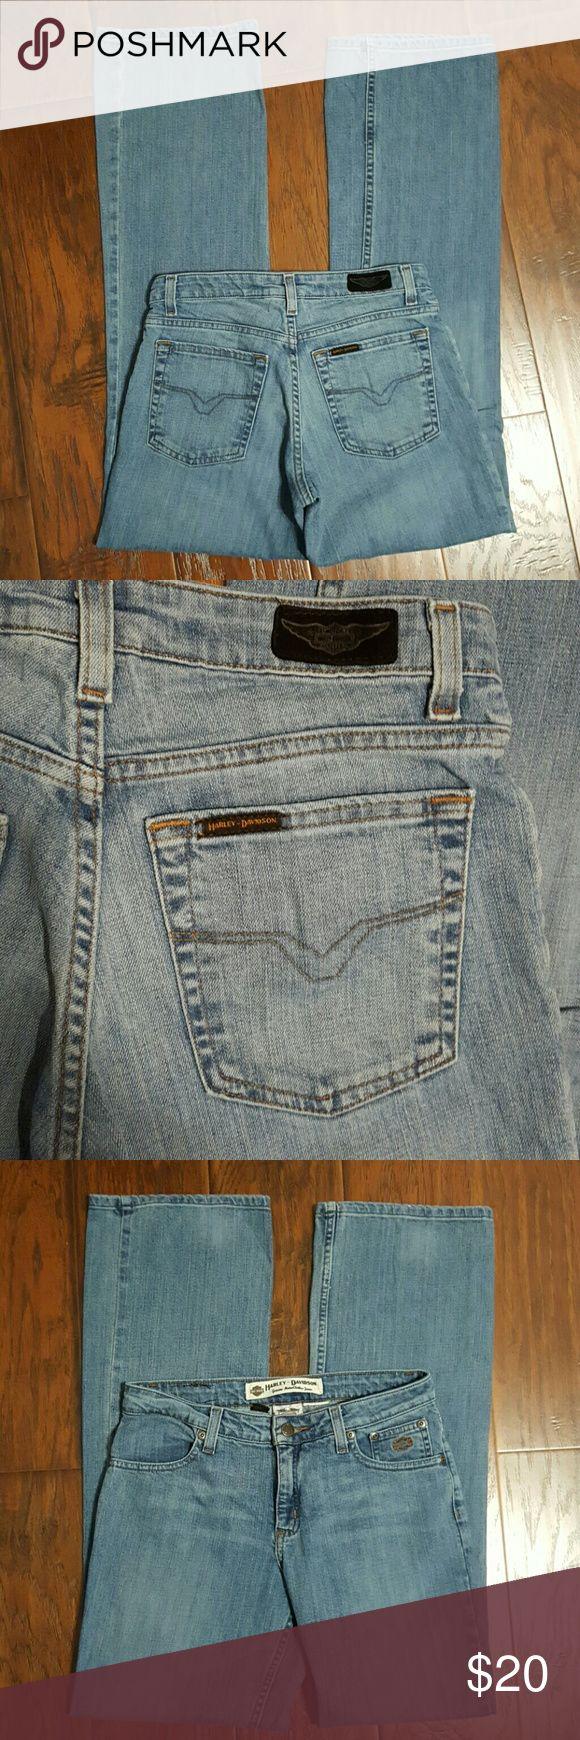 Harley Davidson jeans size 2 Harley Davidson jeans size 2. Inseam is 31.5 inches.. Harley-Davidson Jeans